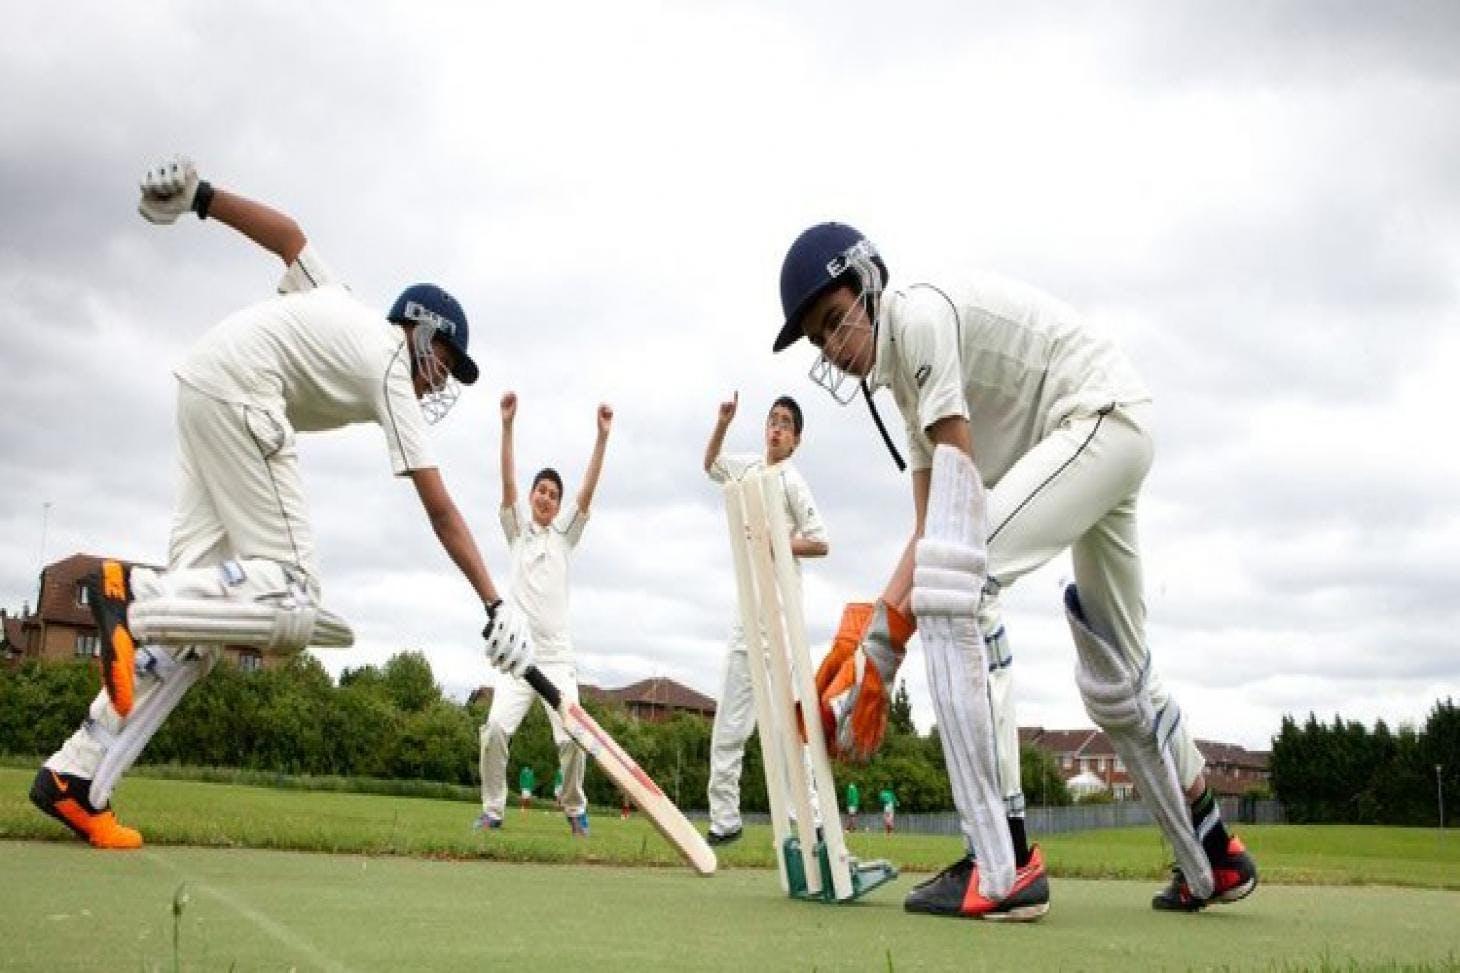 Challney High School for Boys Full size | Grass cricket facilities